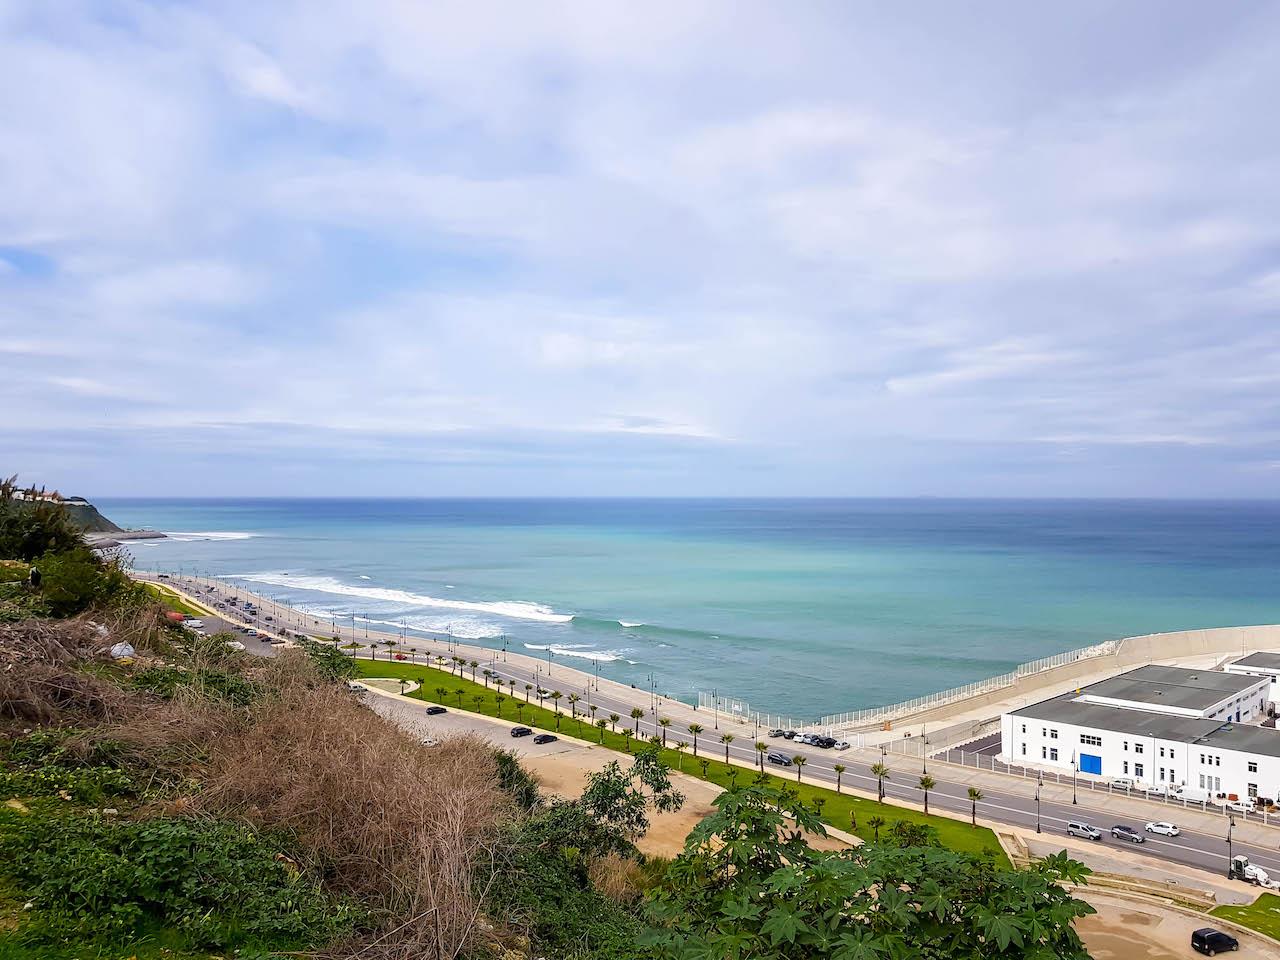 Strand in Tanger.